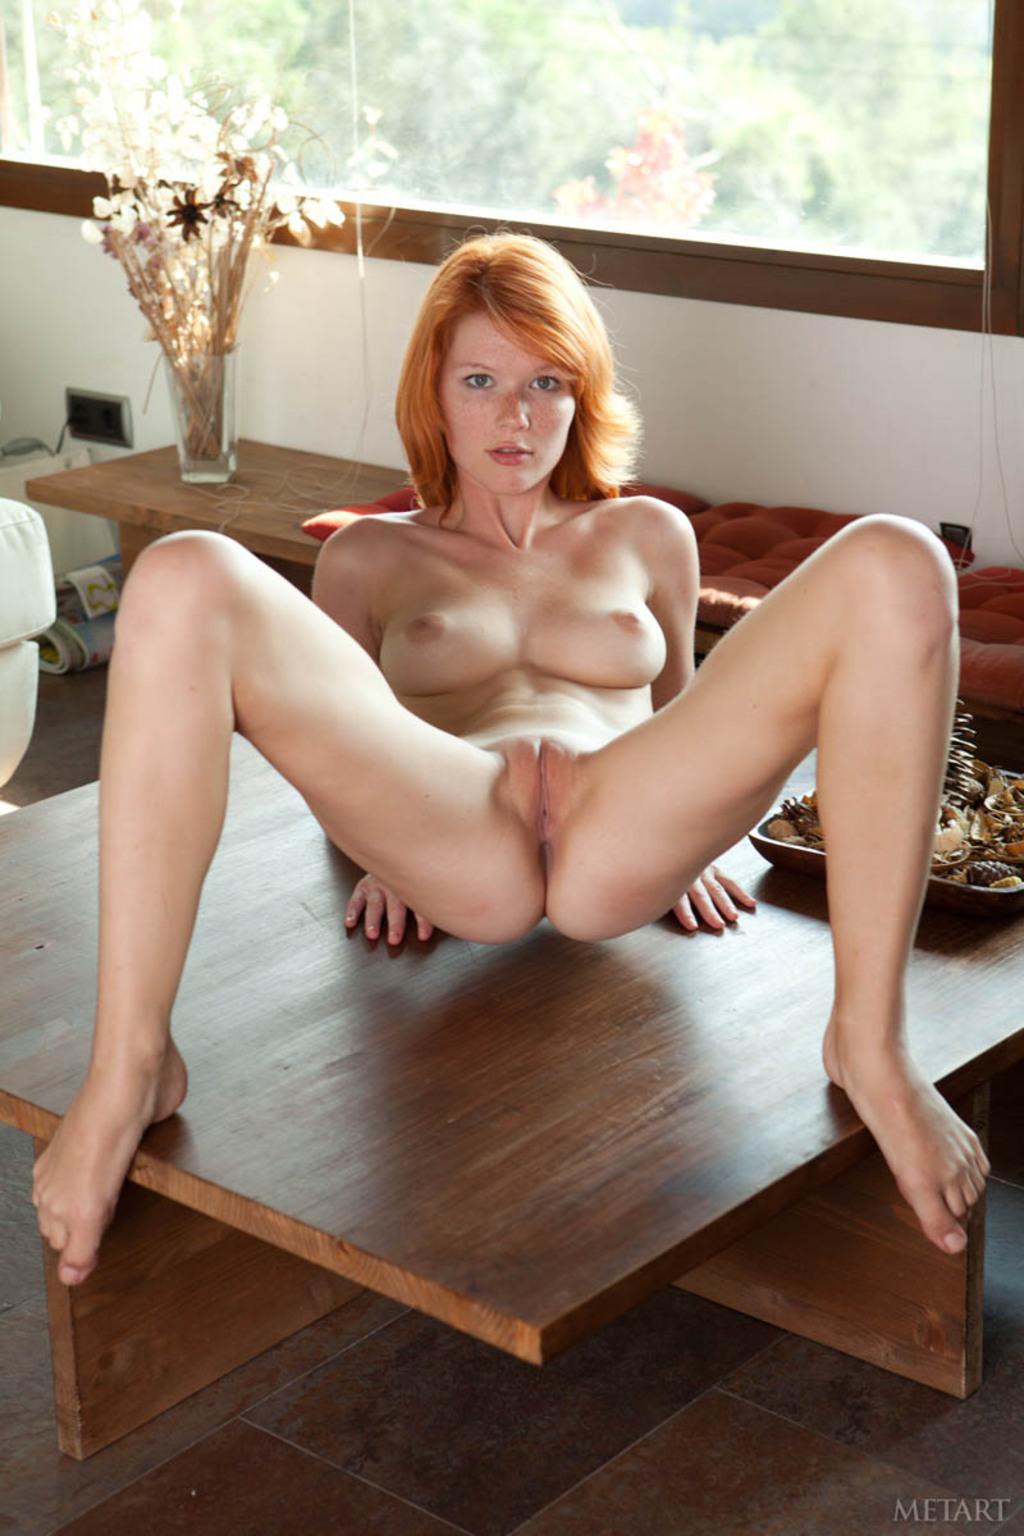 shaved redhead mia sollis spreading   picture 4 12 babeimpact